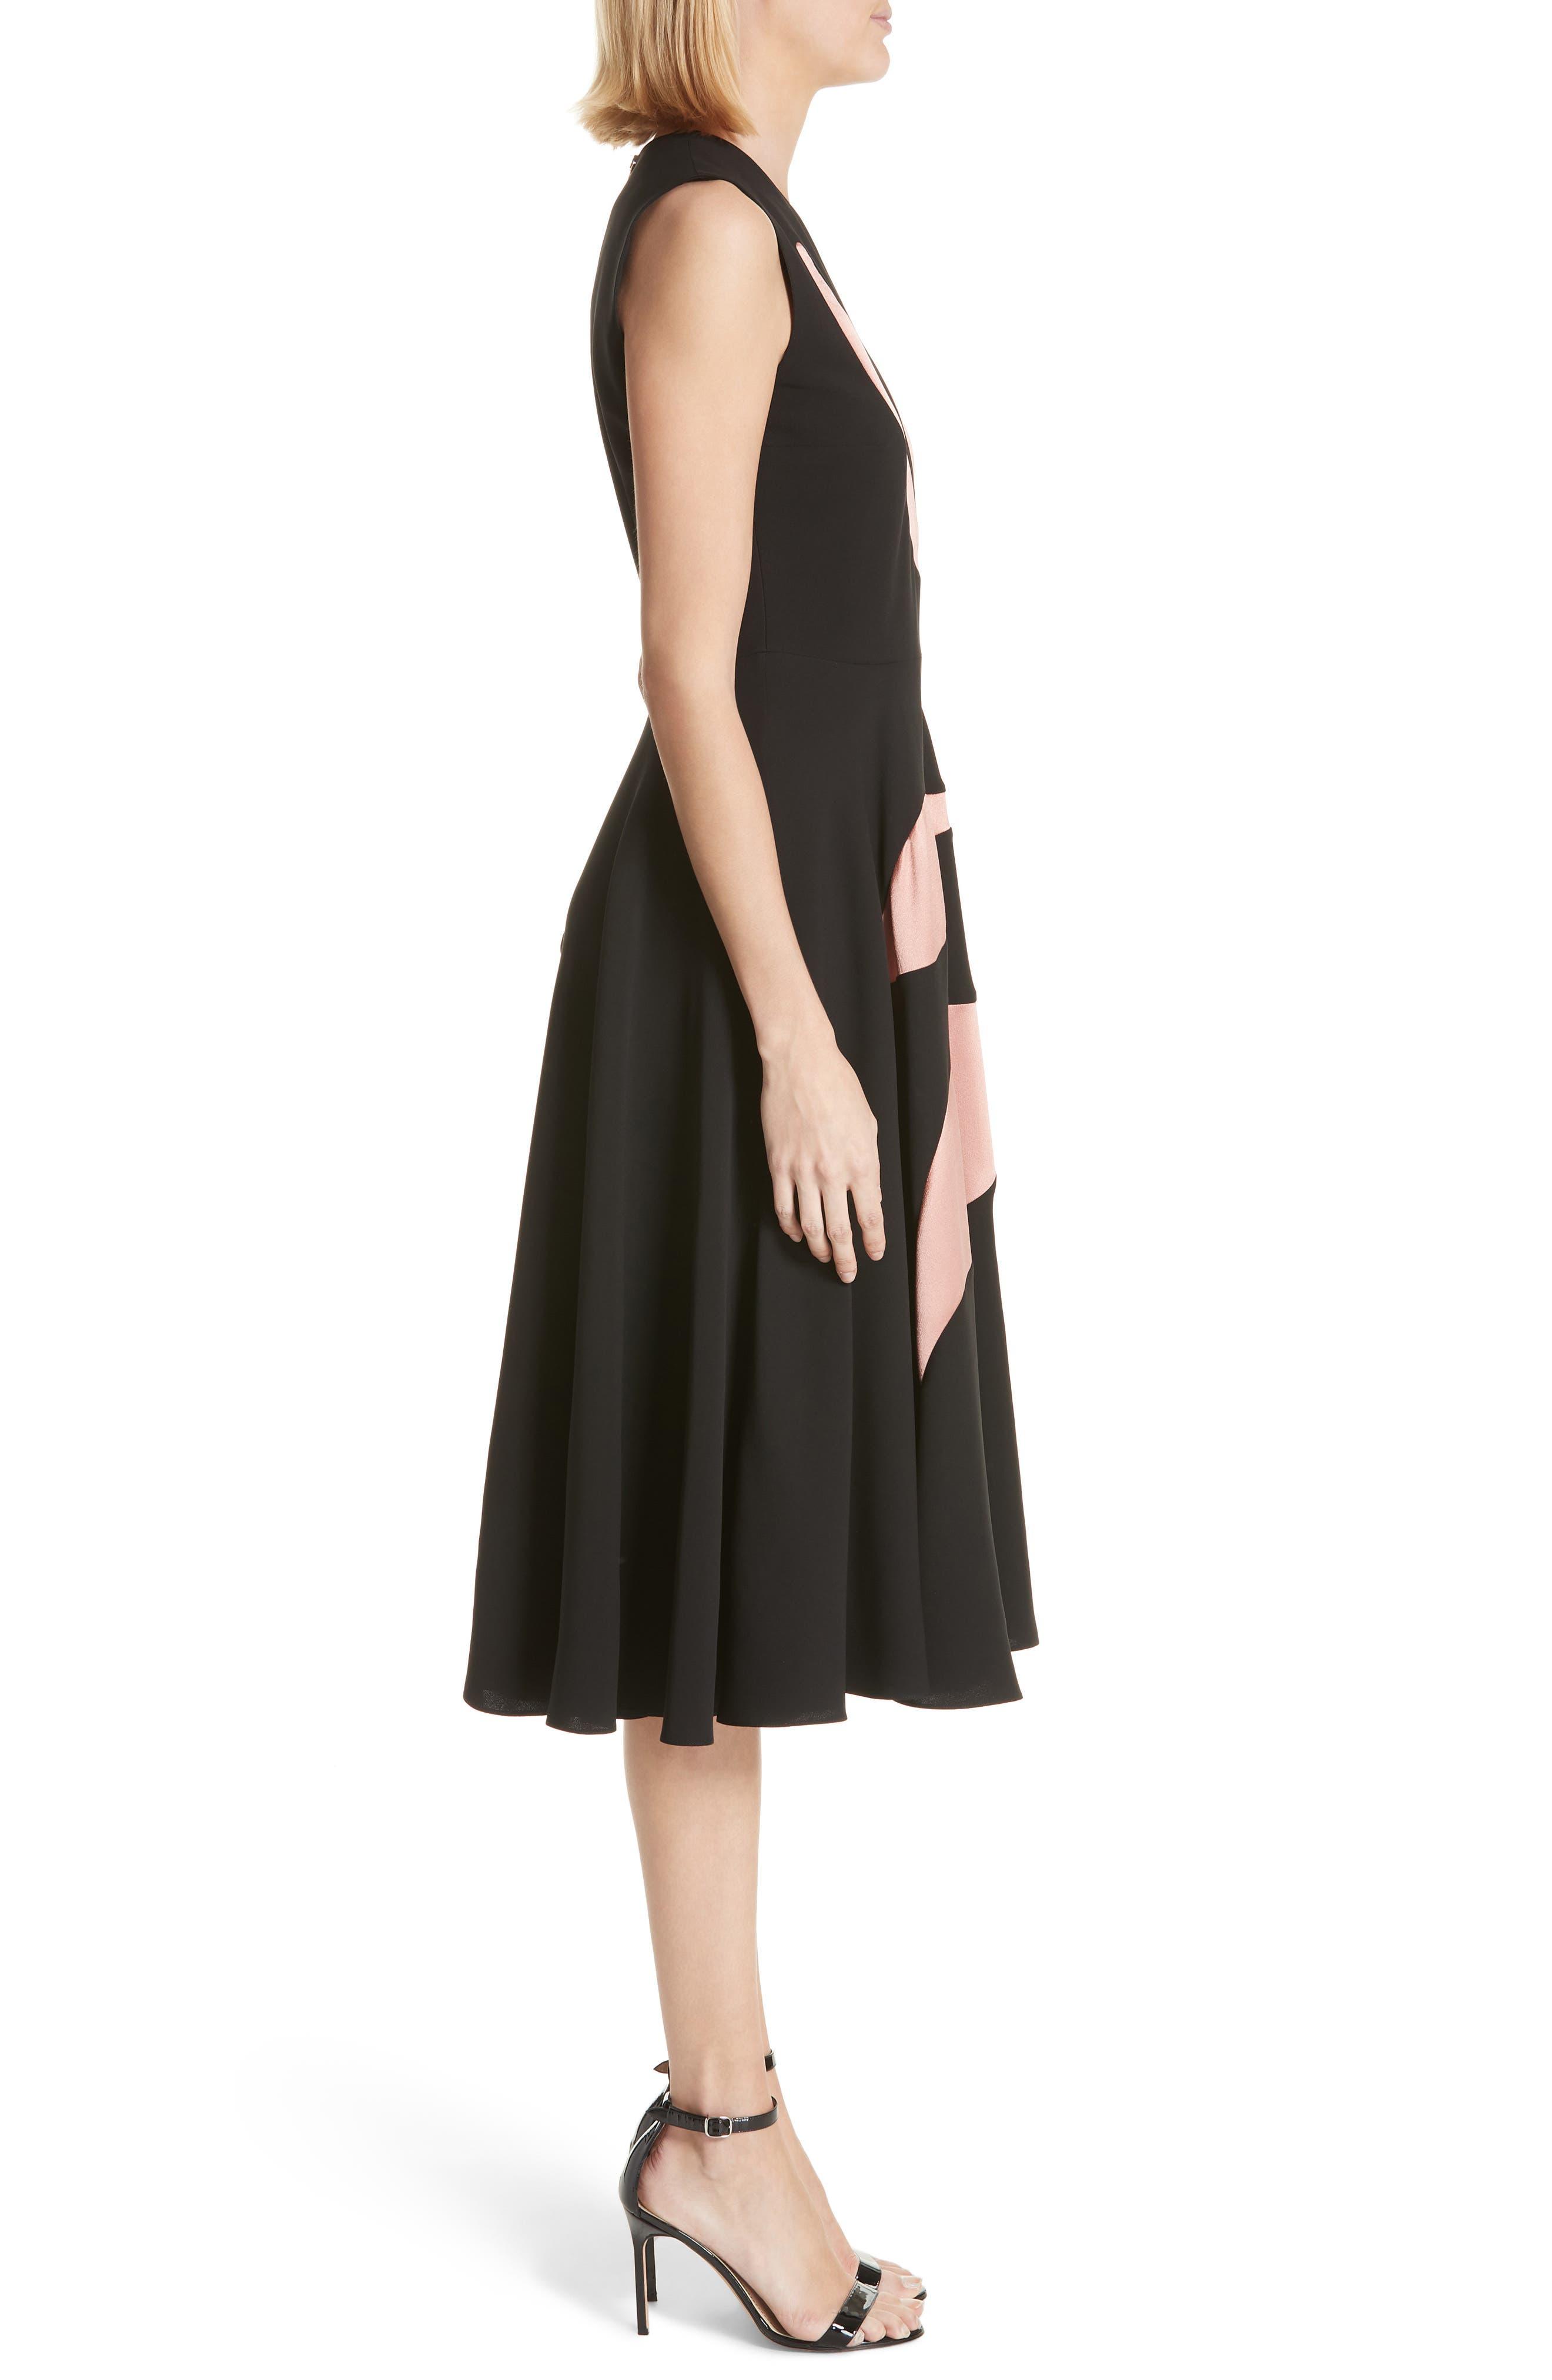 Ilia Floral Inlay Silk Blend Dress,                             Alternate thumbnail 3, color,                             001